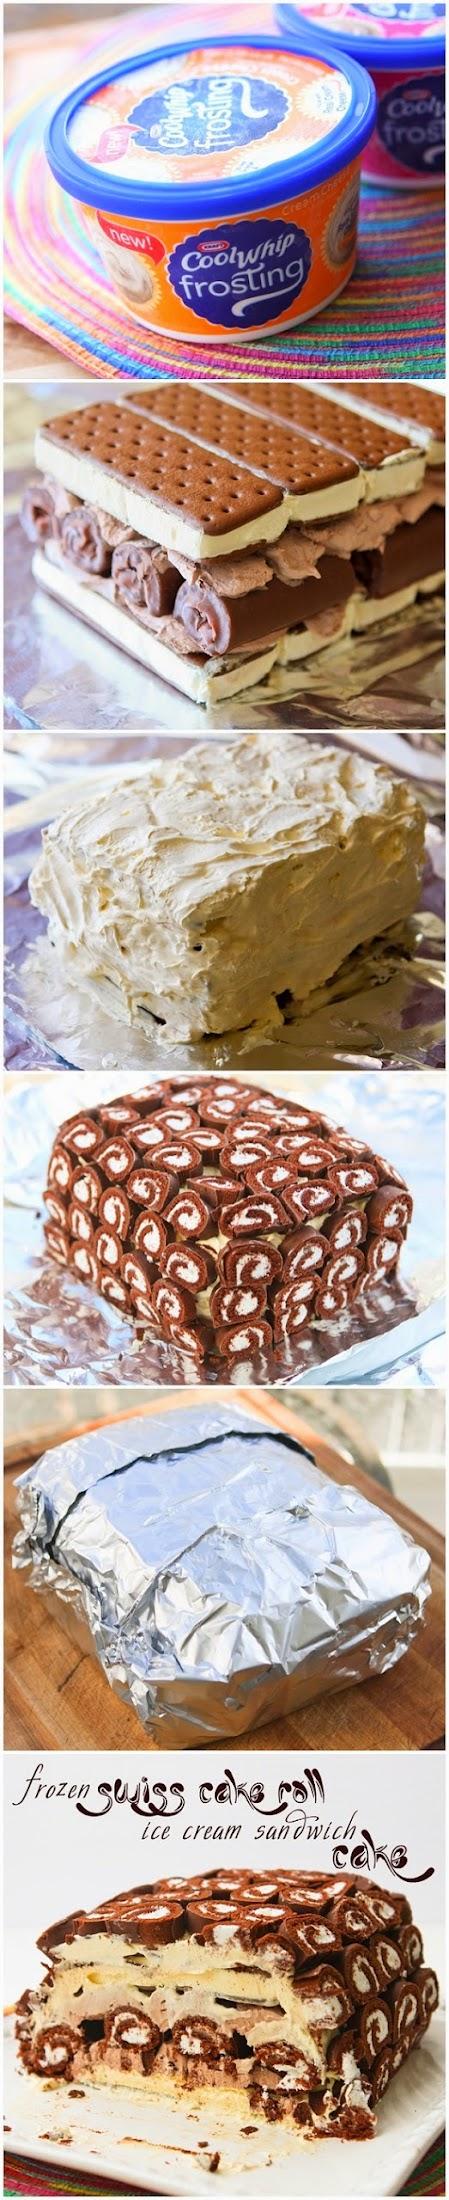 Frozen swiss cake roll ice cream sandwich cake